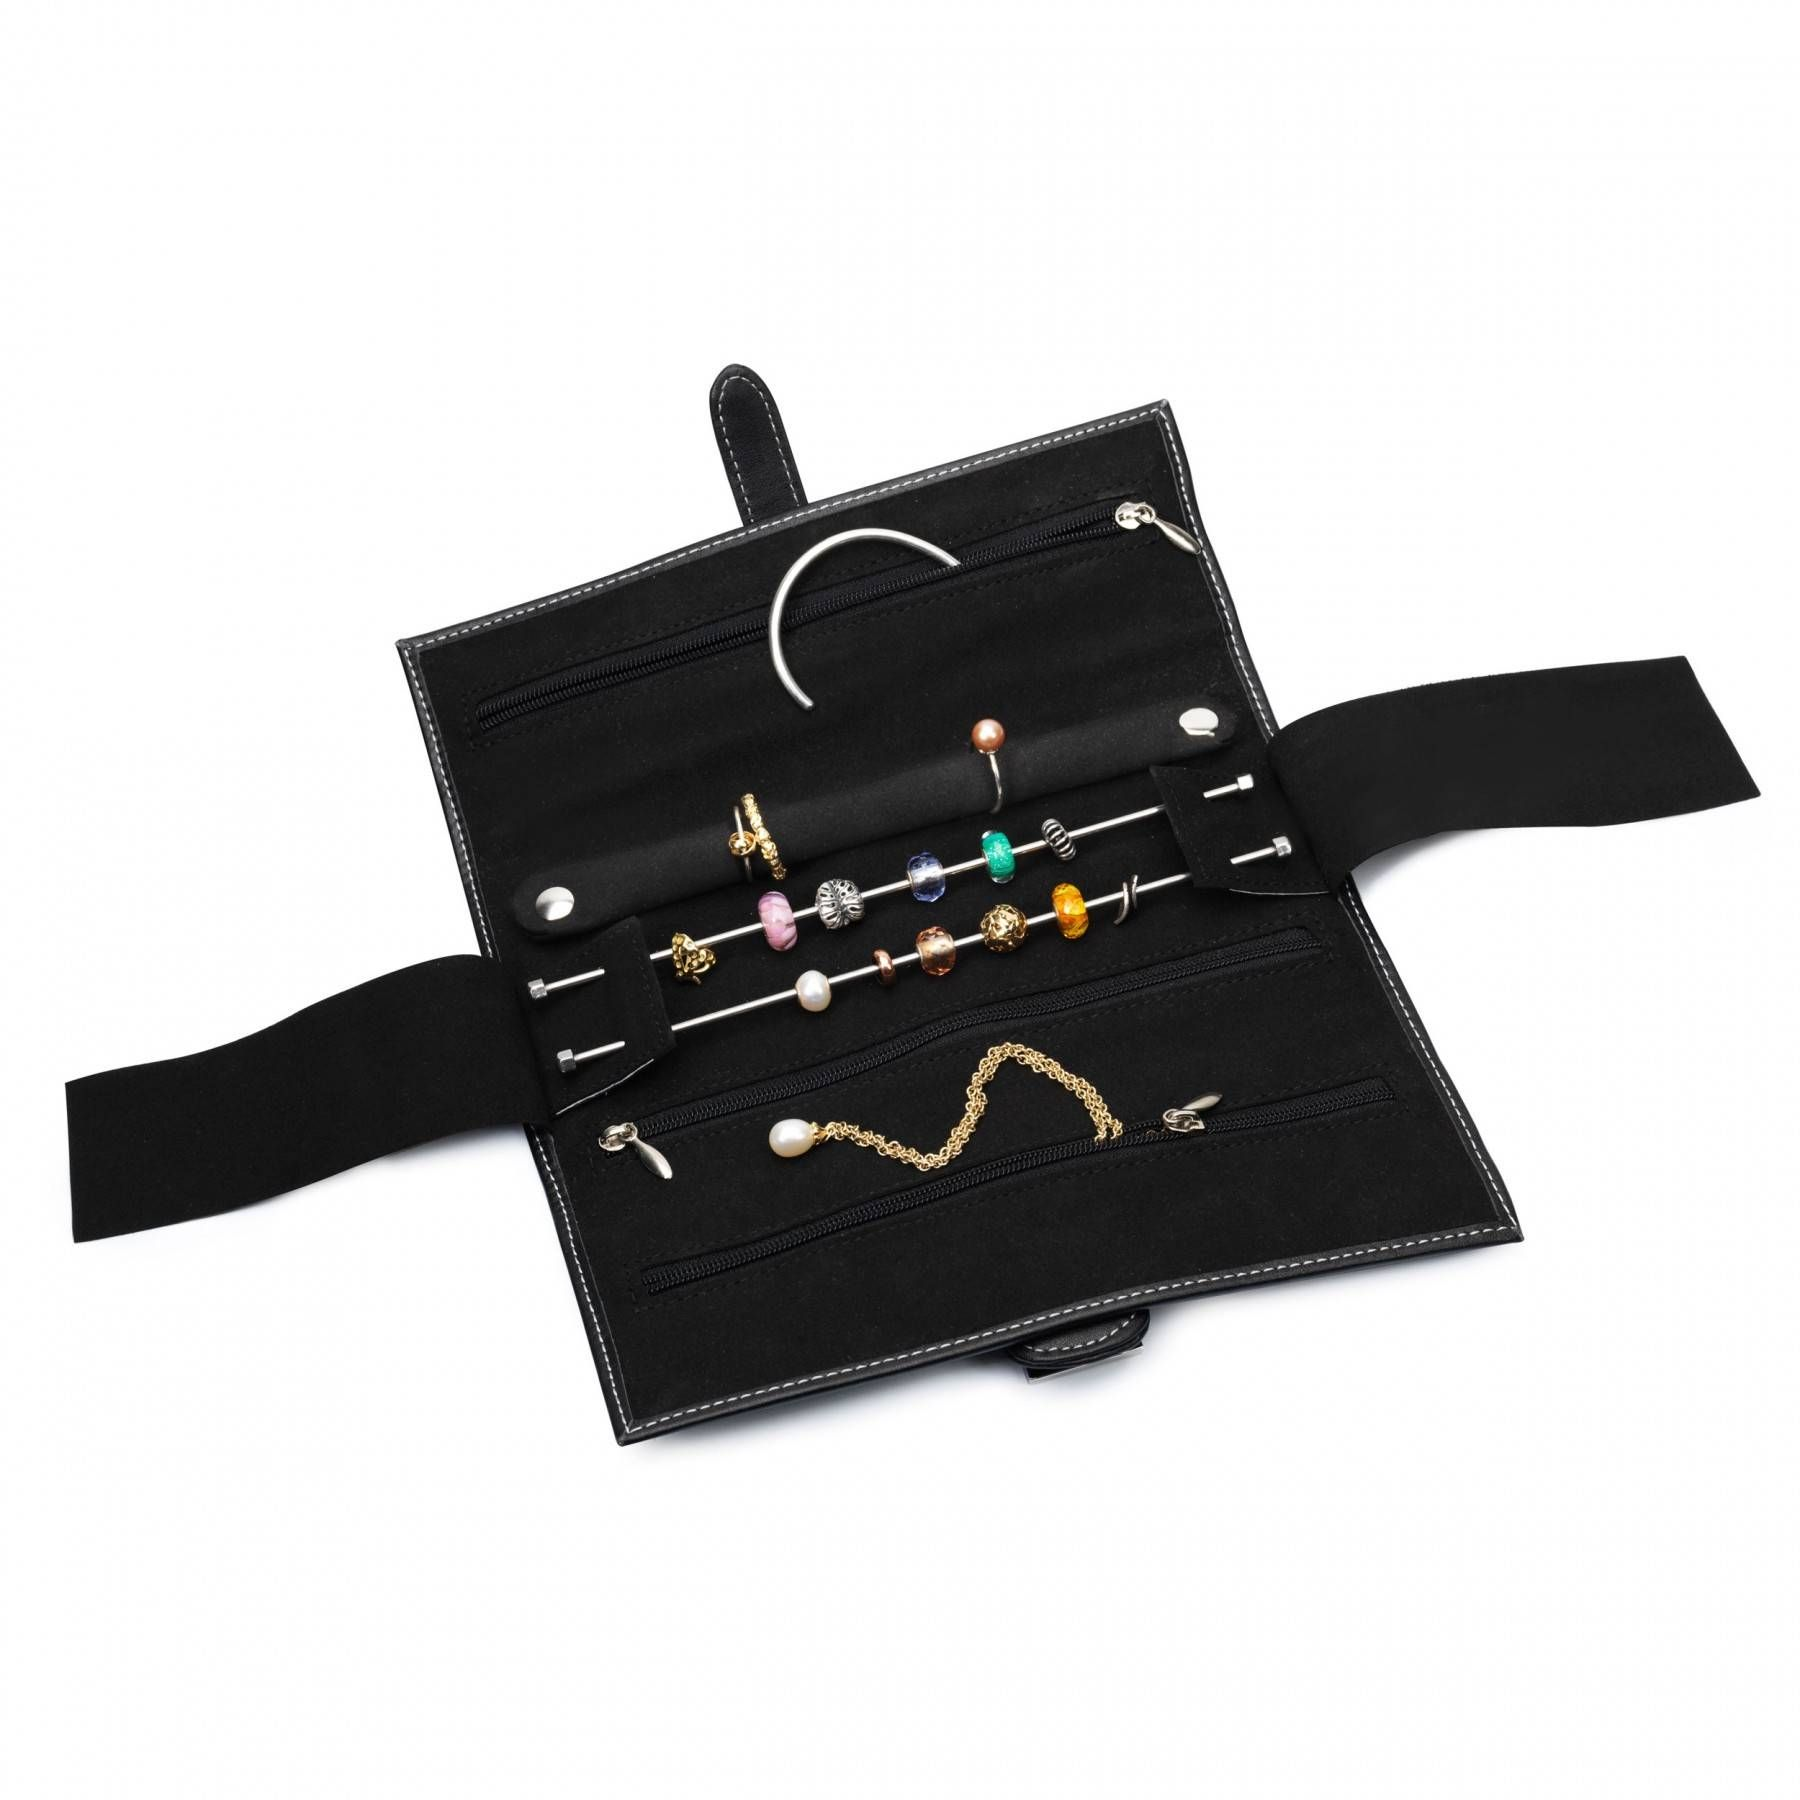 Designer Fashion Jewellery Brands Trollbeads Trollbeads Leather